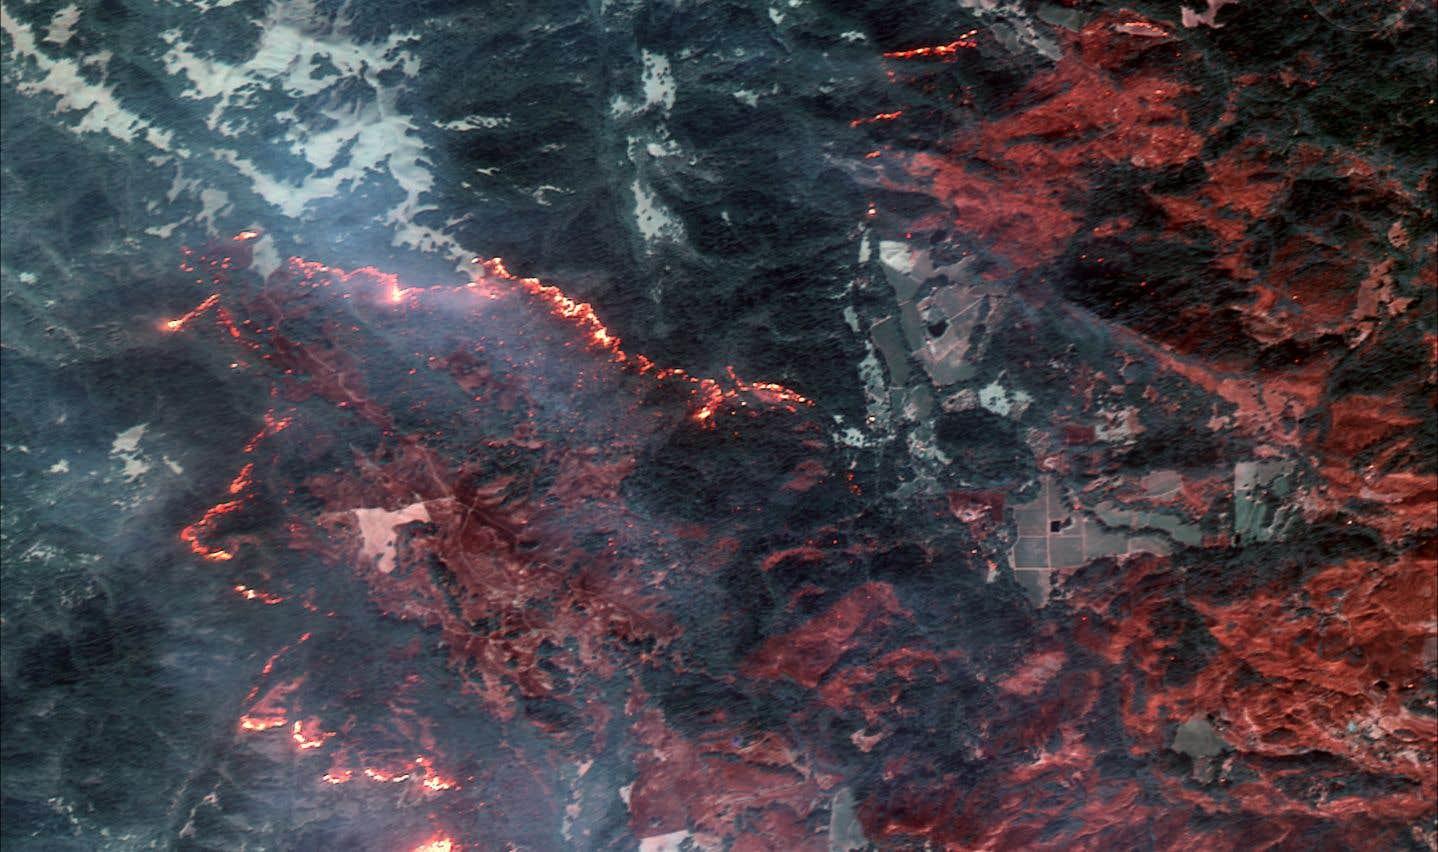 La ville de Santa Rosa brûle, 10 octobre 2017